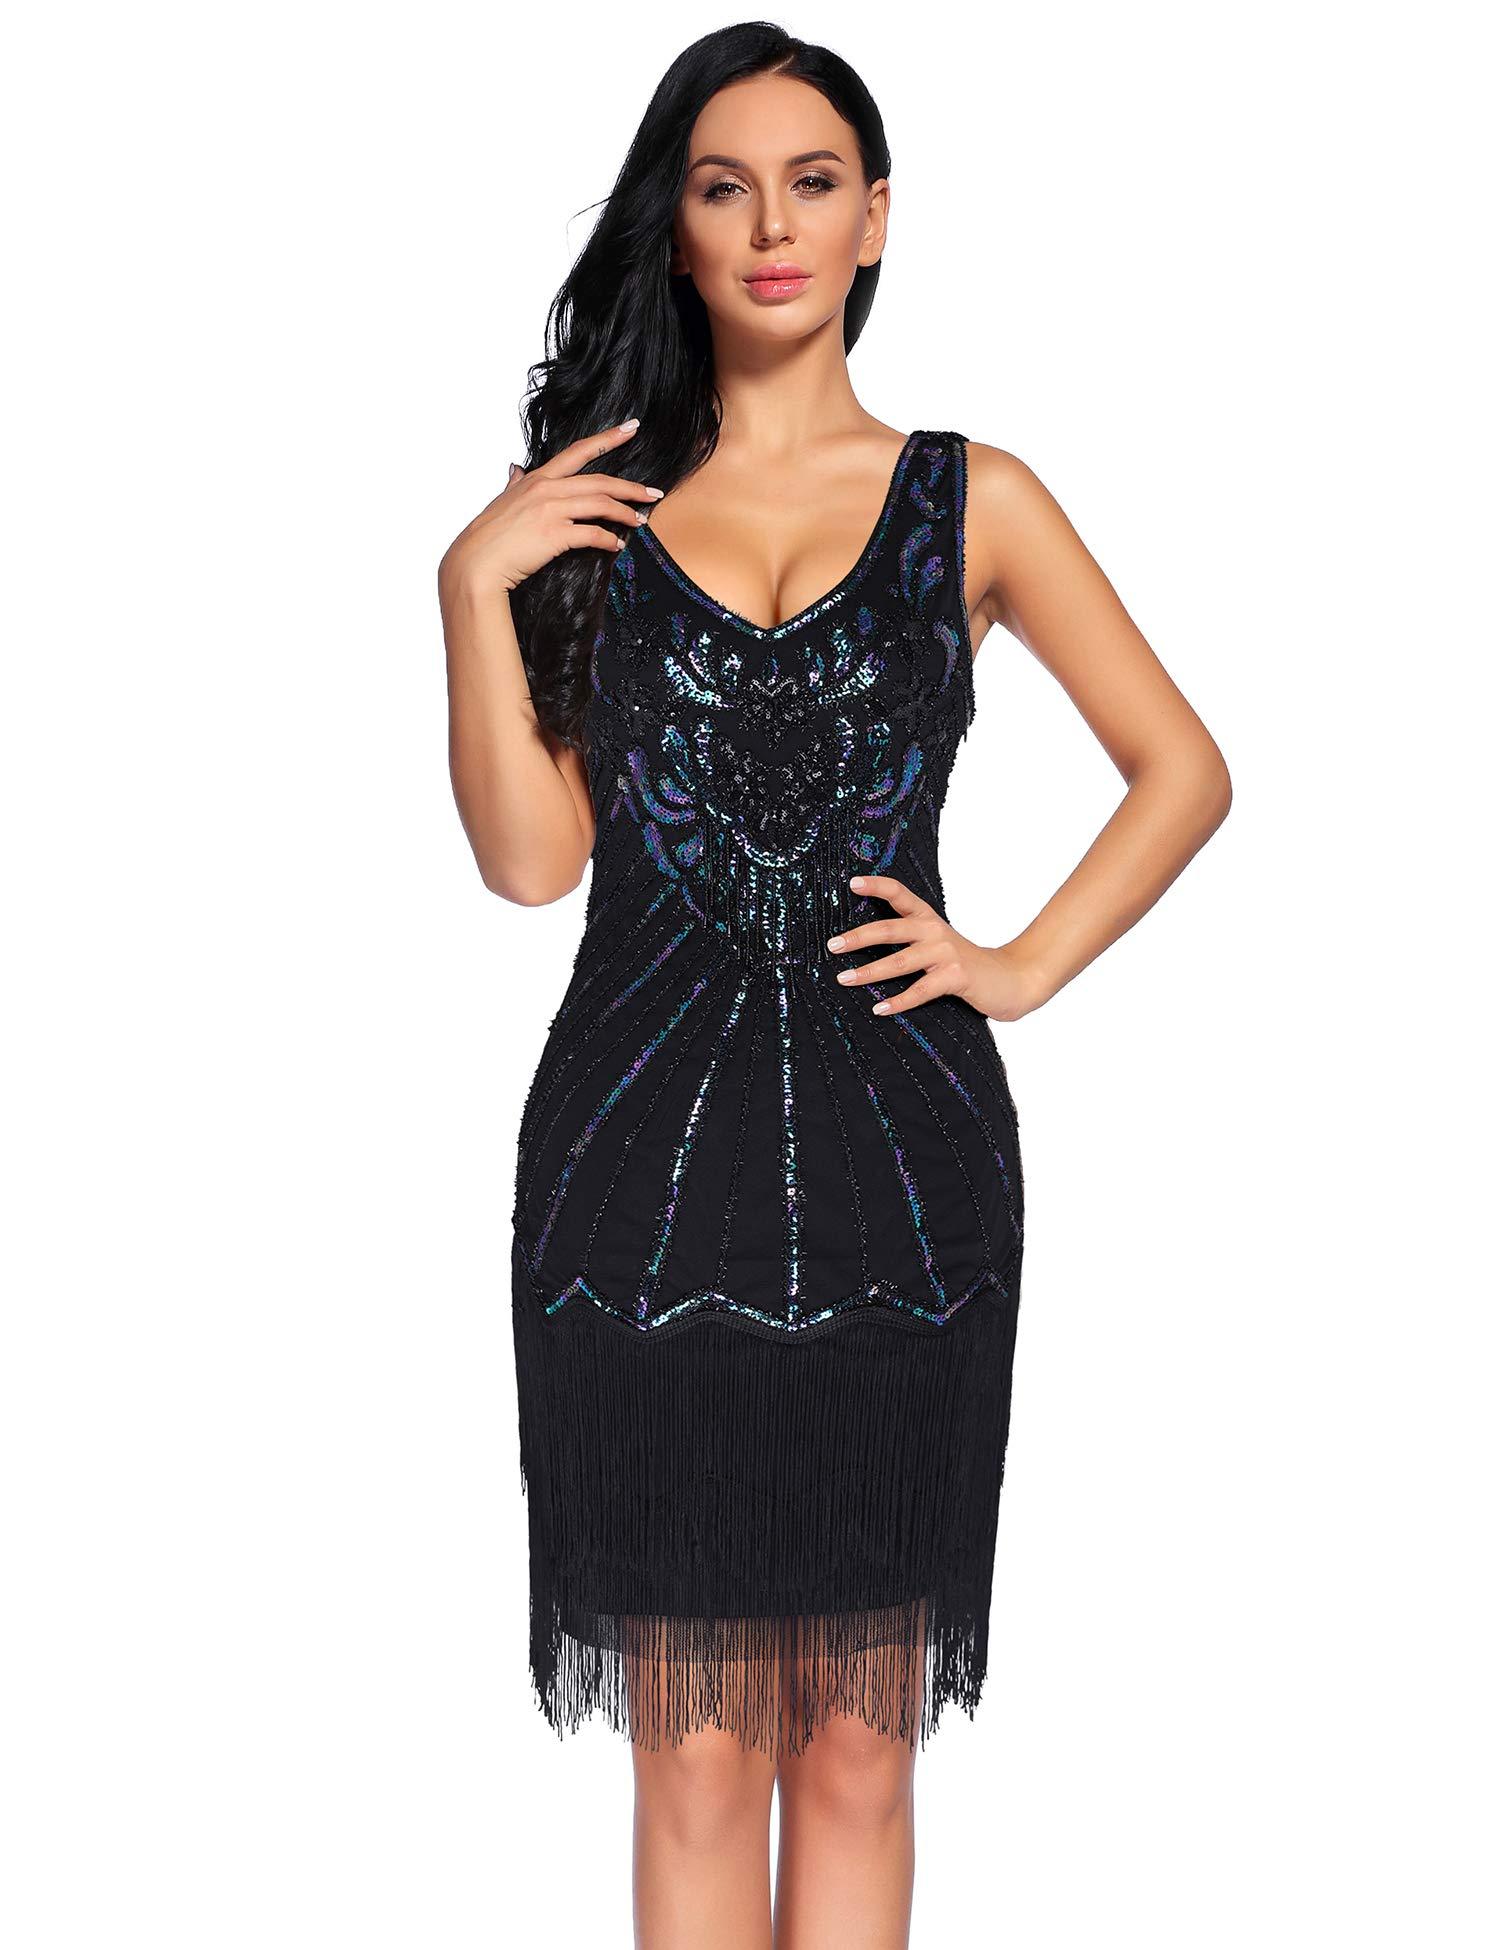 f072db6e383 Women s 1920s V Neck Flapper Dress Sequin Embellished Gatsby Tassels  Cocktail Dress (Black